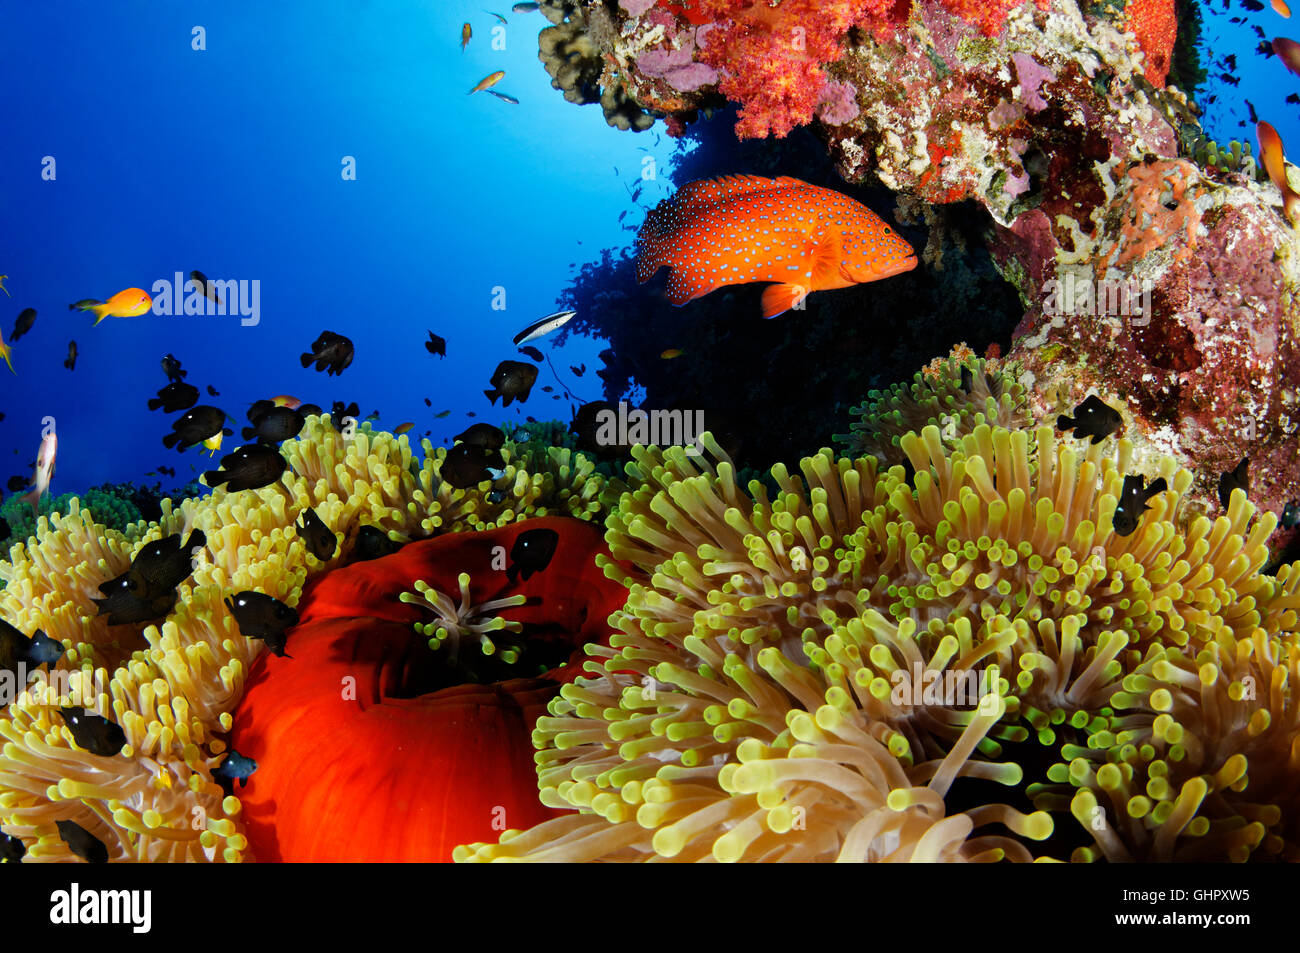 Coral reef with magnificent sea anemone and Three Spot Domino Damsel, Abu Fandera, Red Sea, Egypt Stock Photo